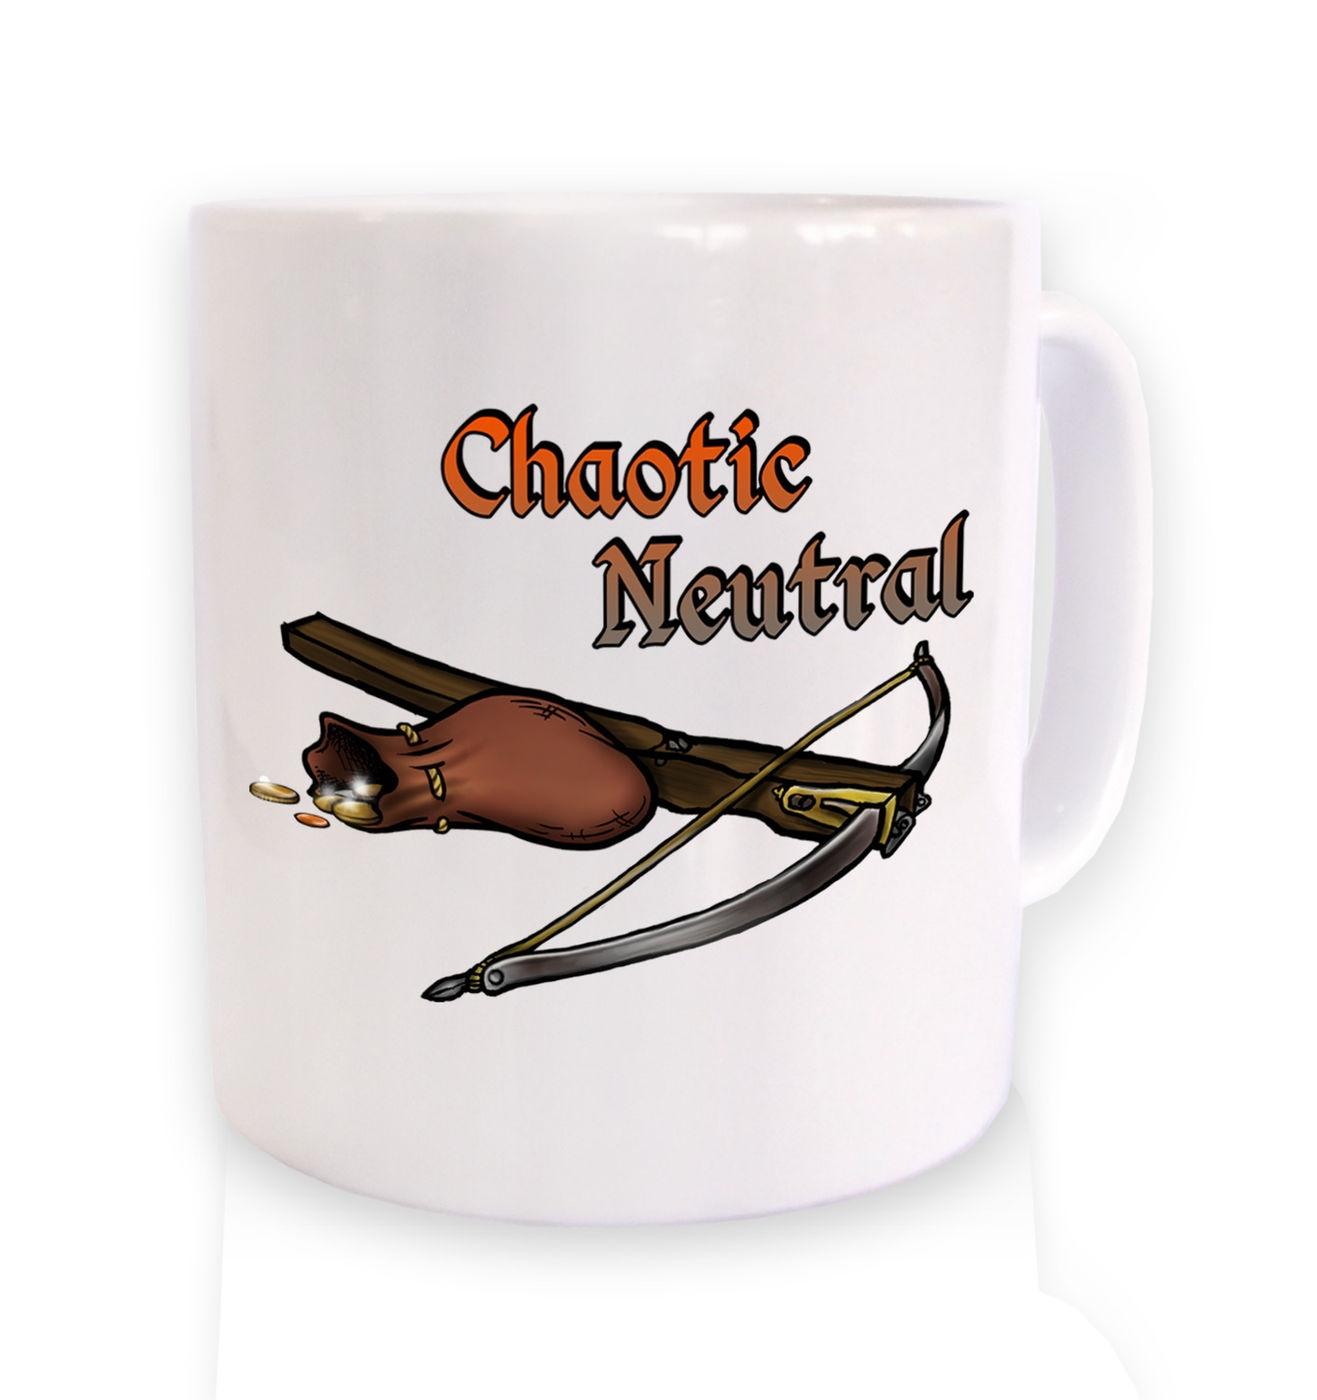 Cartoon Alignment Chaotic Neutral ceramic mug - gaming mugs